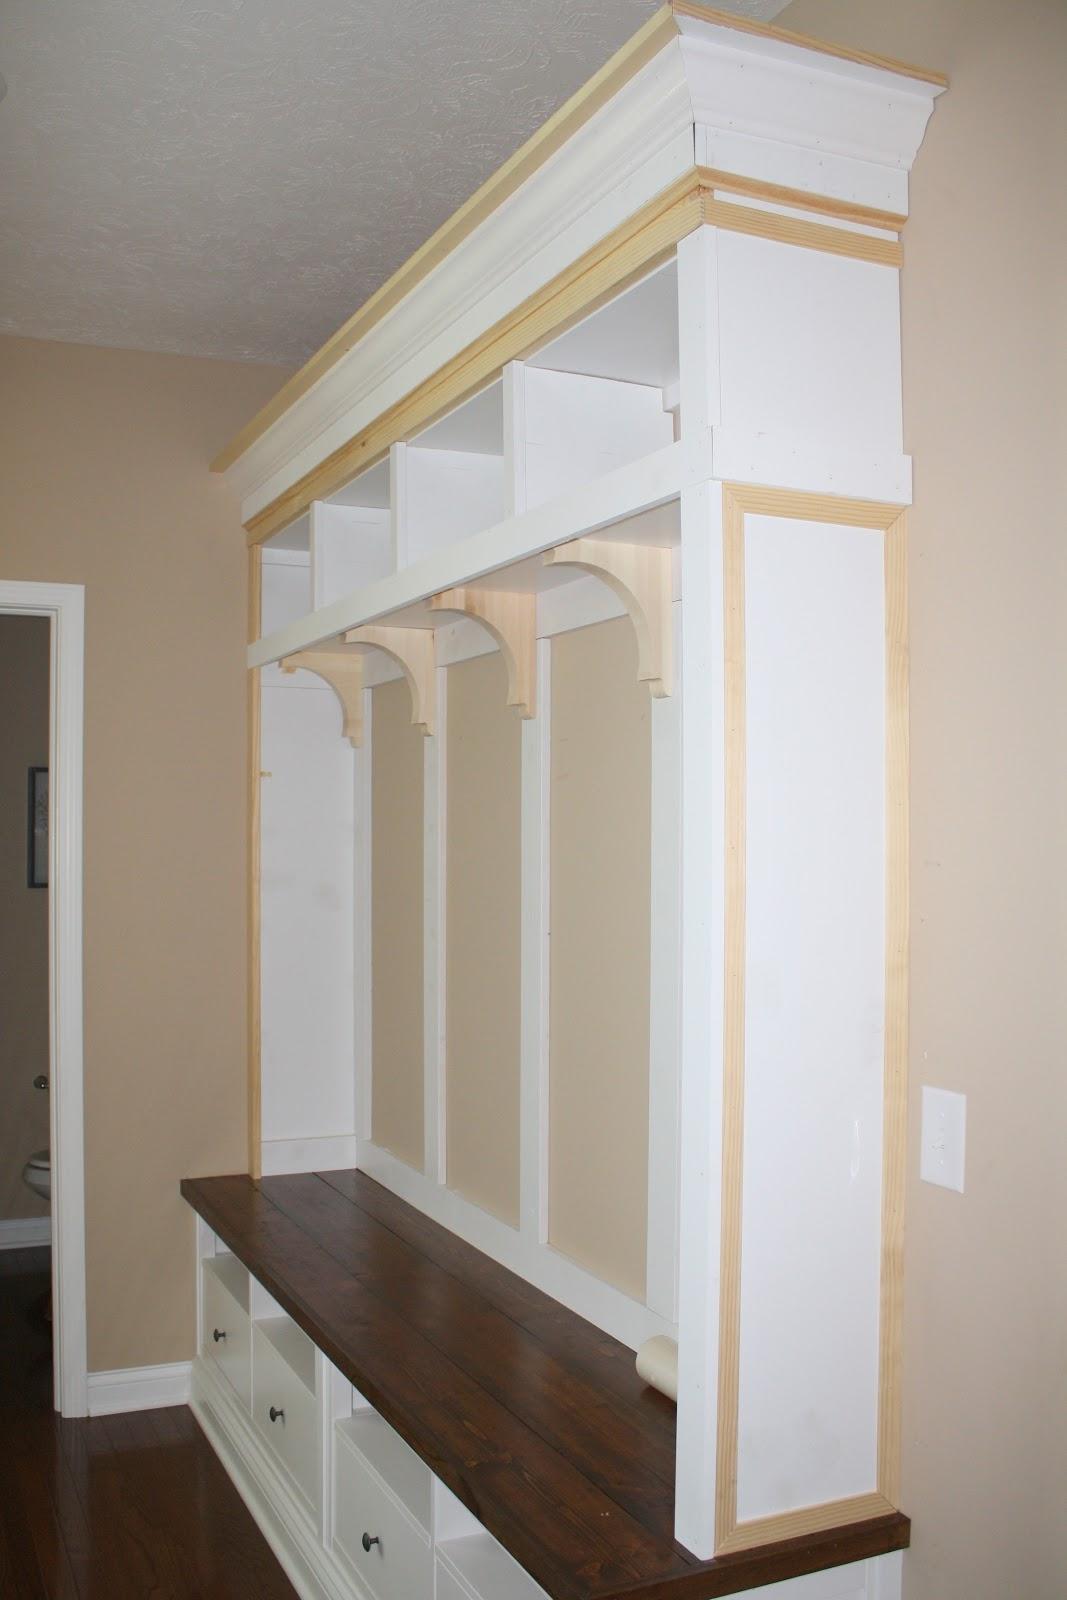 making mudroom storage from an ikea hack. Black Bedroom Furniture Sets. Home Design Ideas